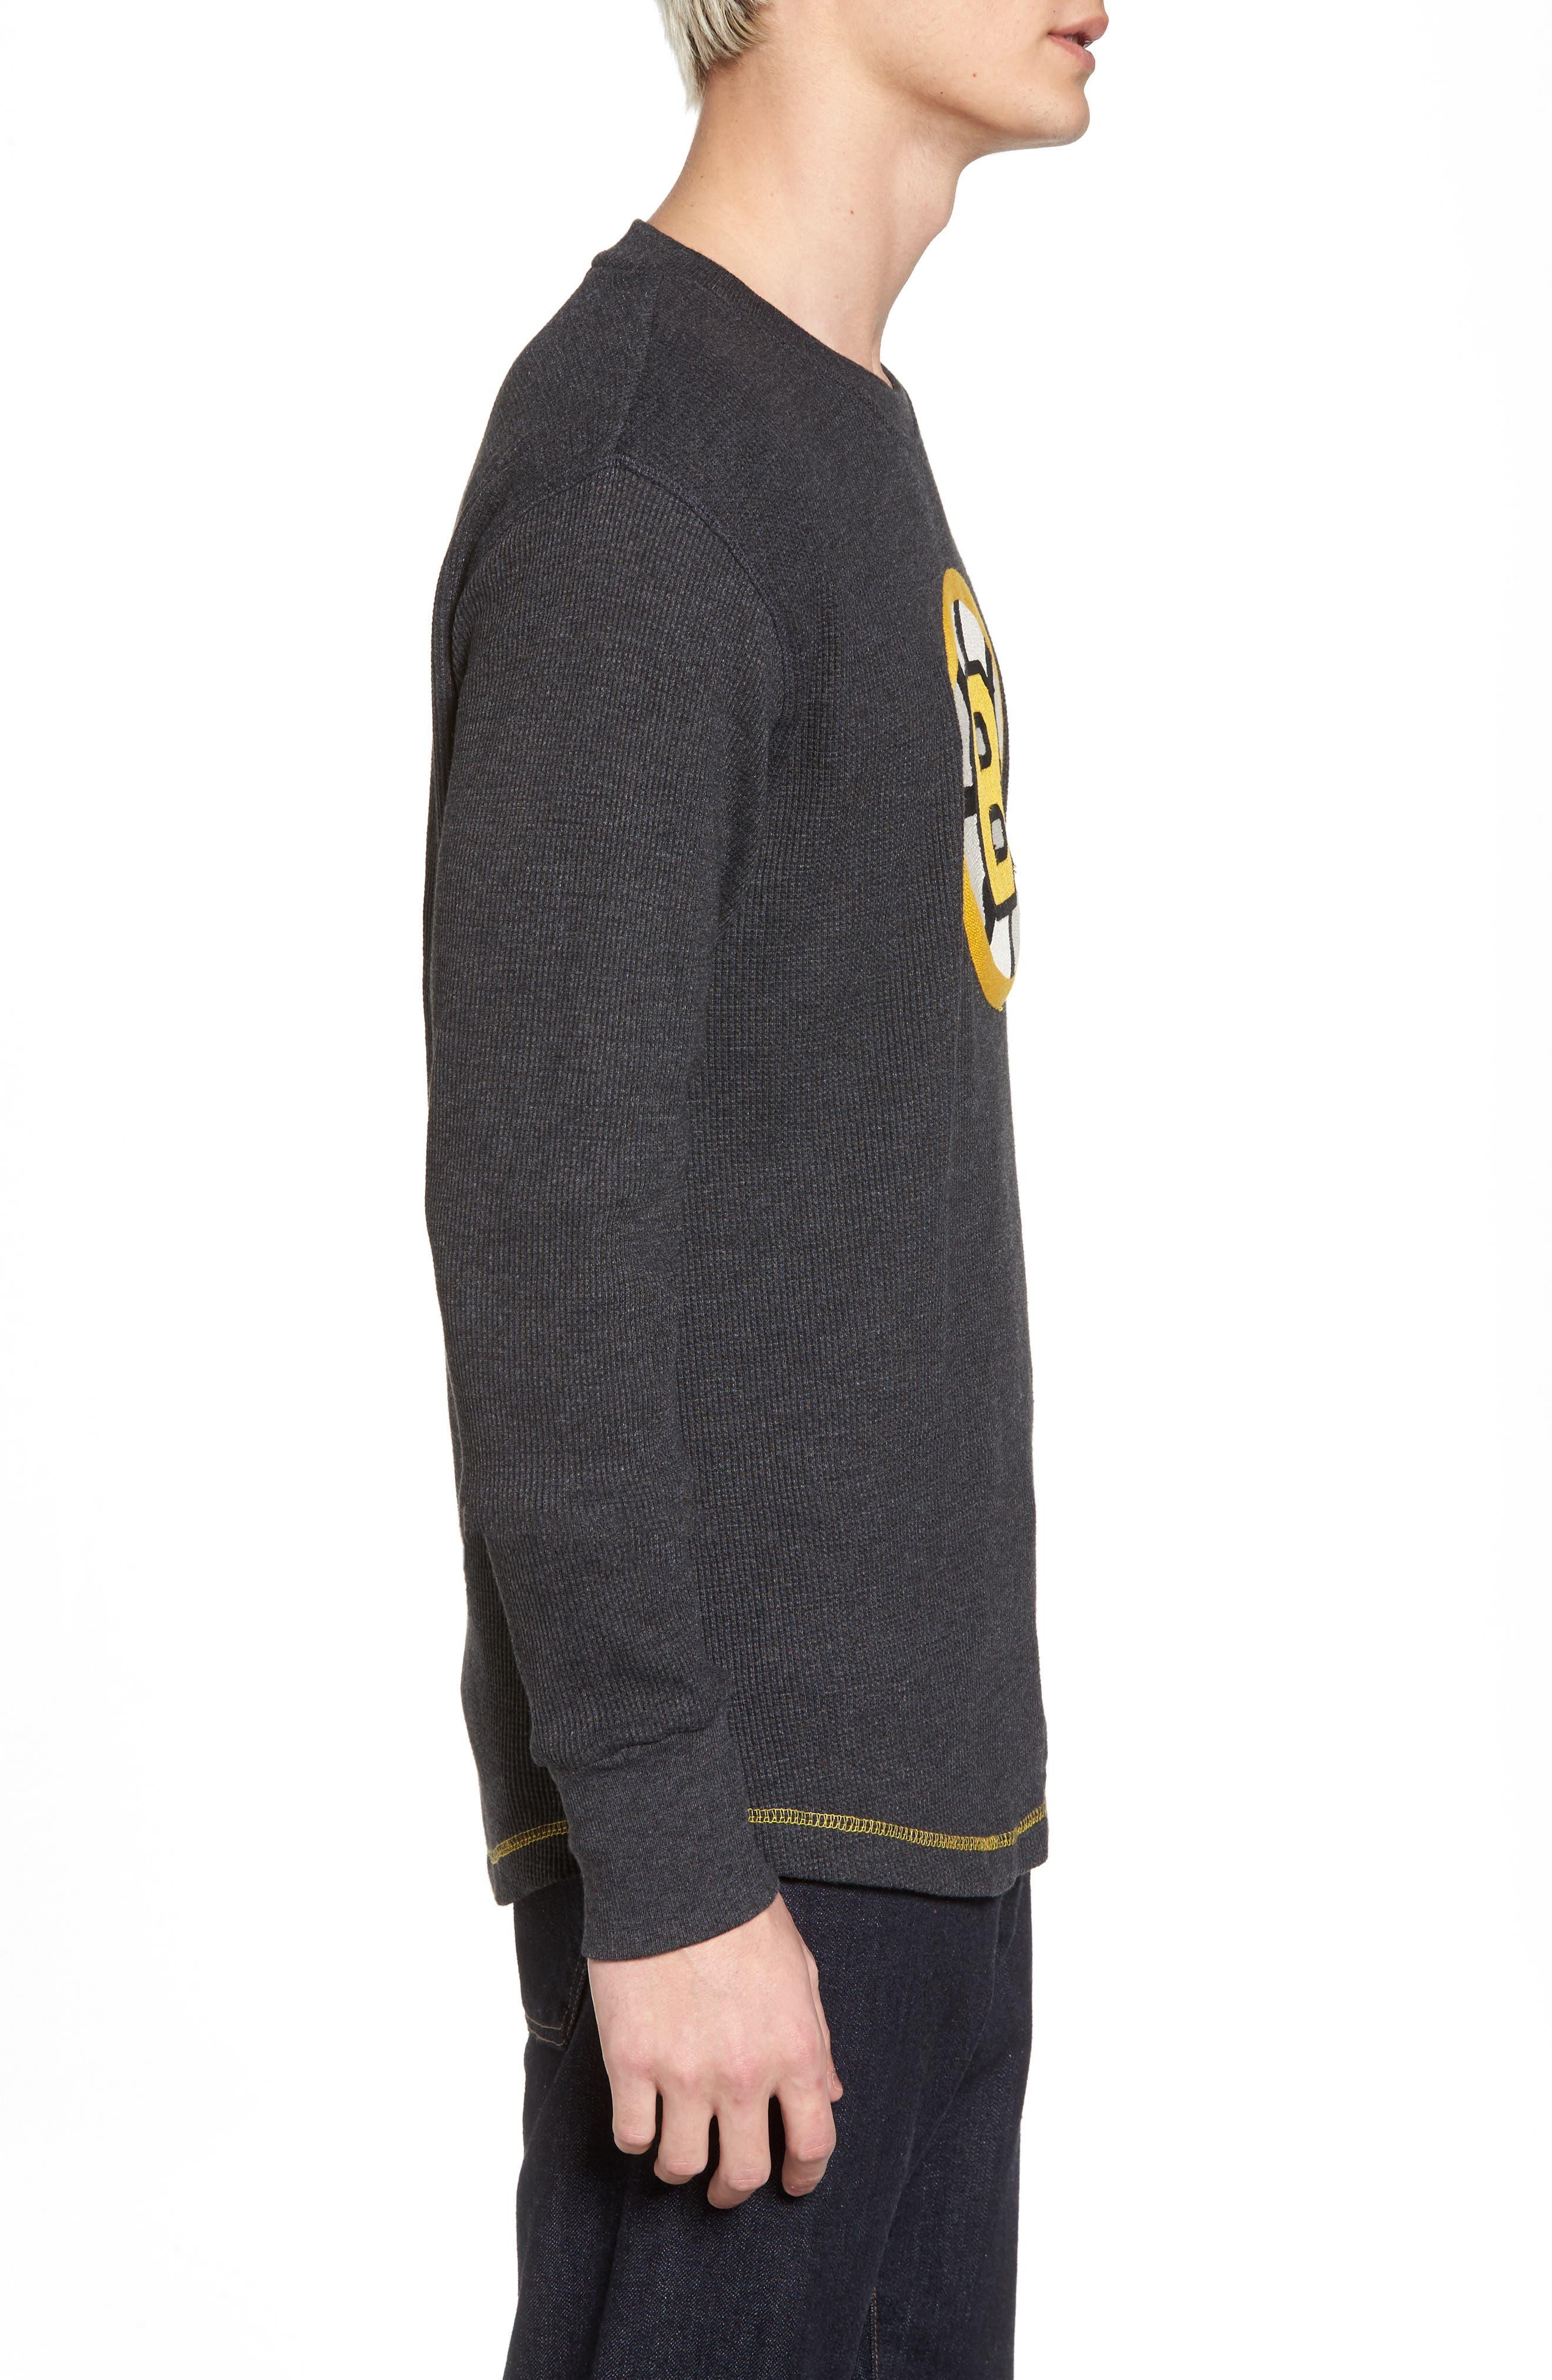 Boston Bruins Embroidered Long Sleeve Thermal Shirt,                             Alternate thumbnail 3, color,                             Black